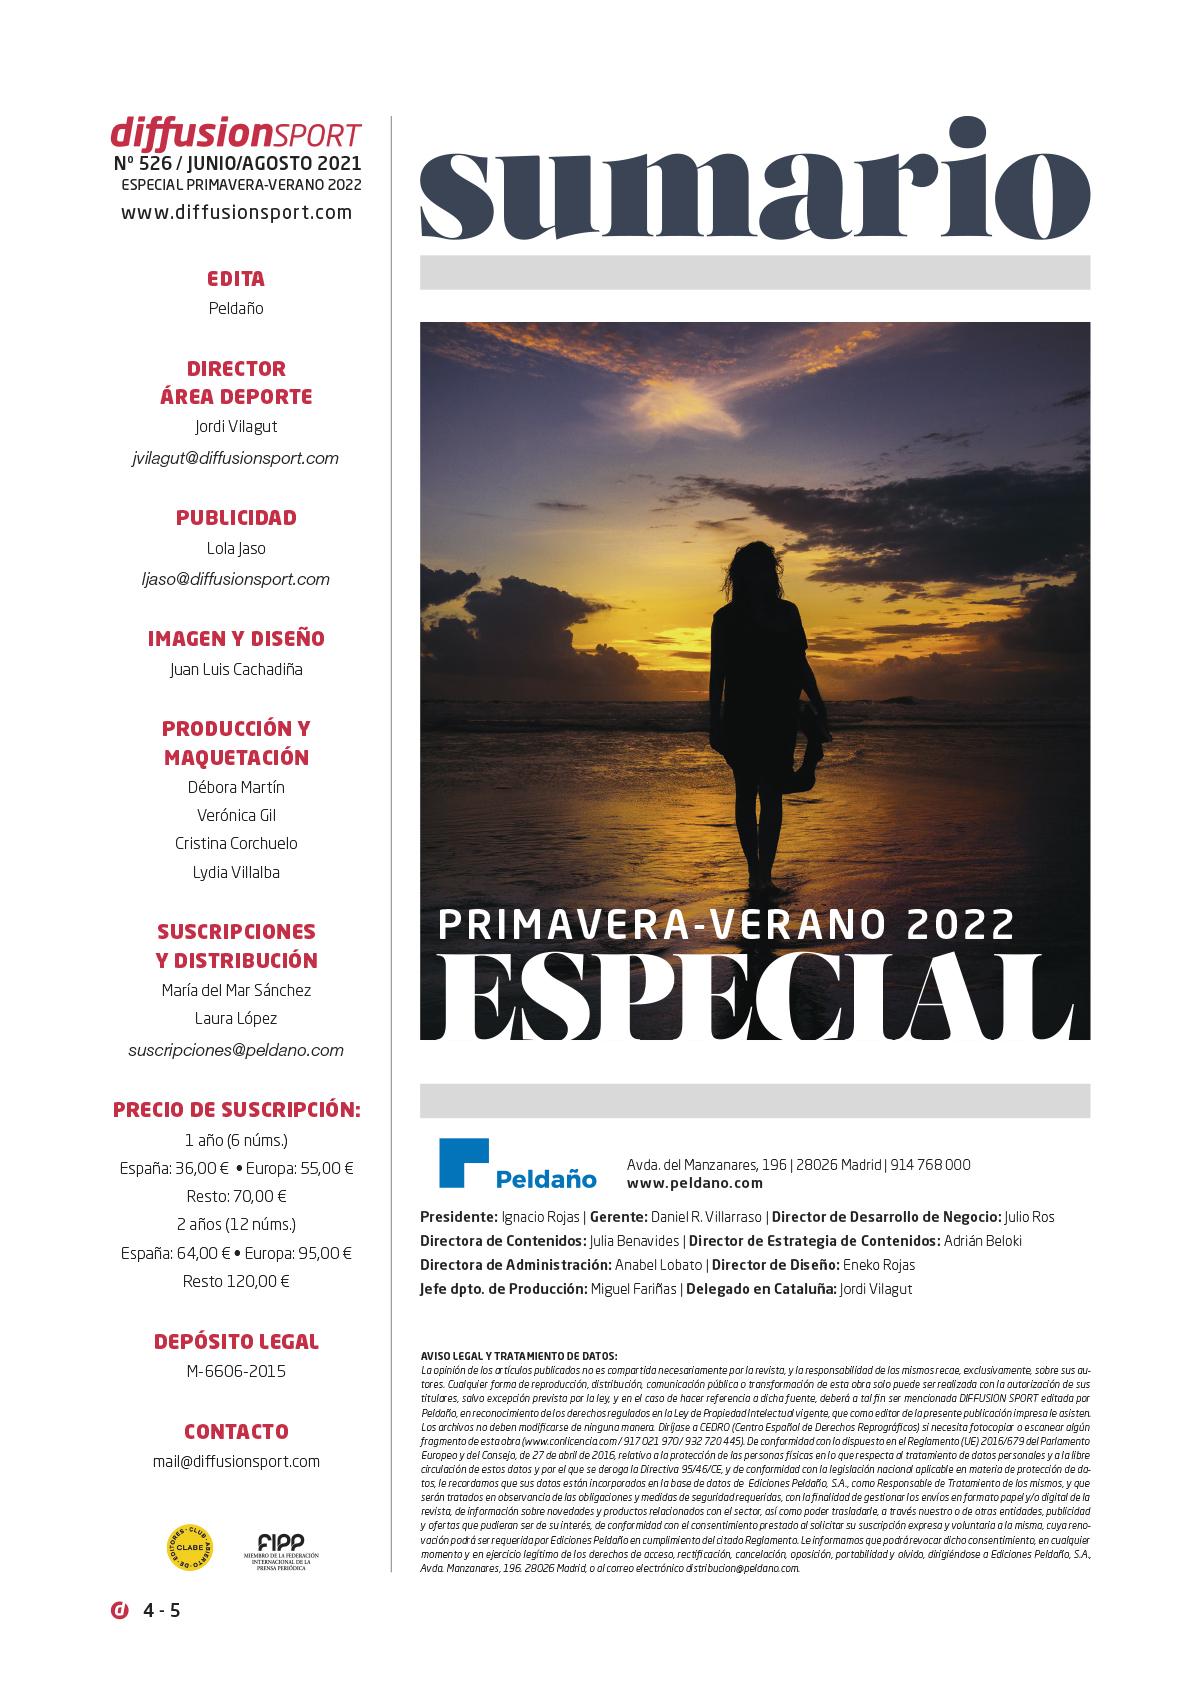 Diffusion Sport Nº 526